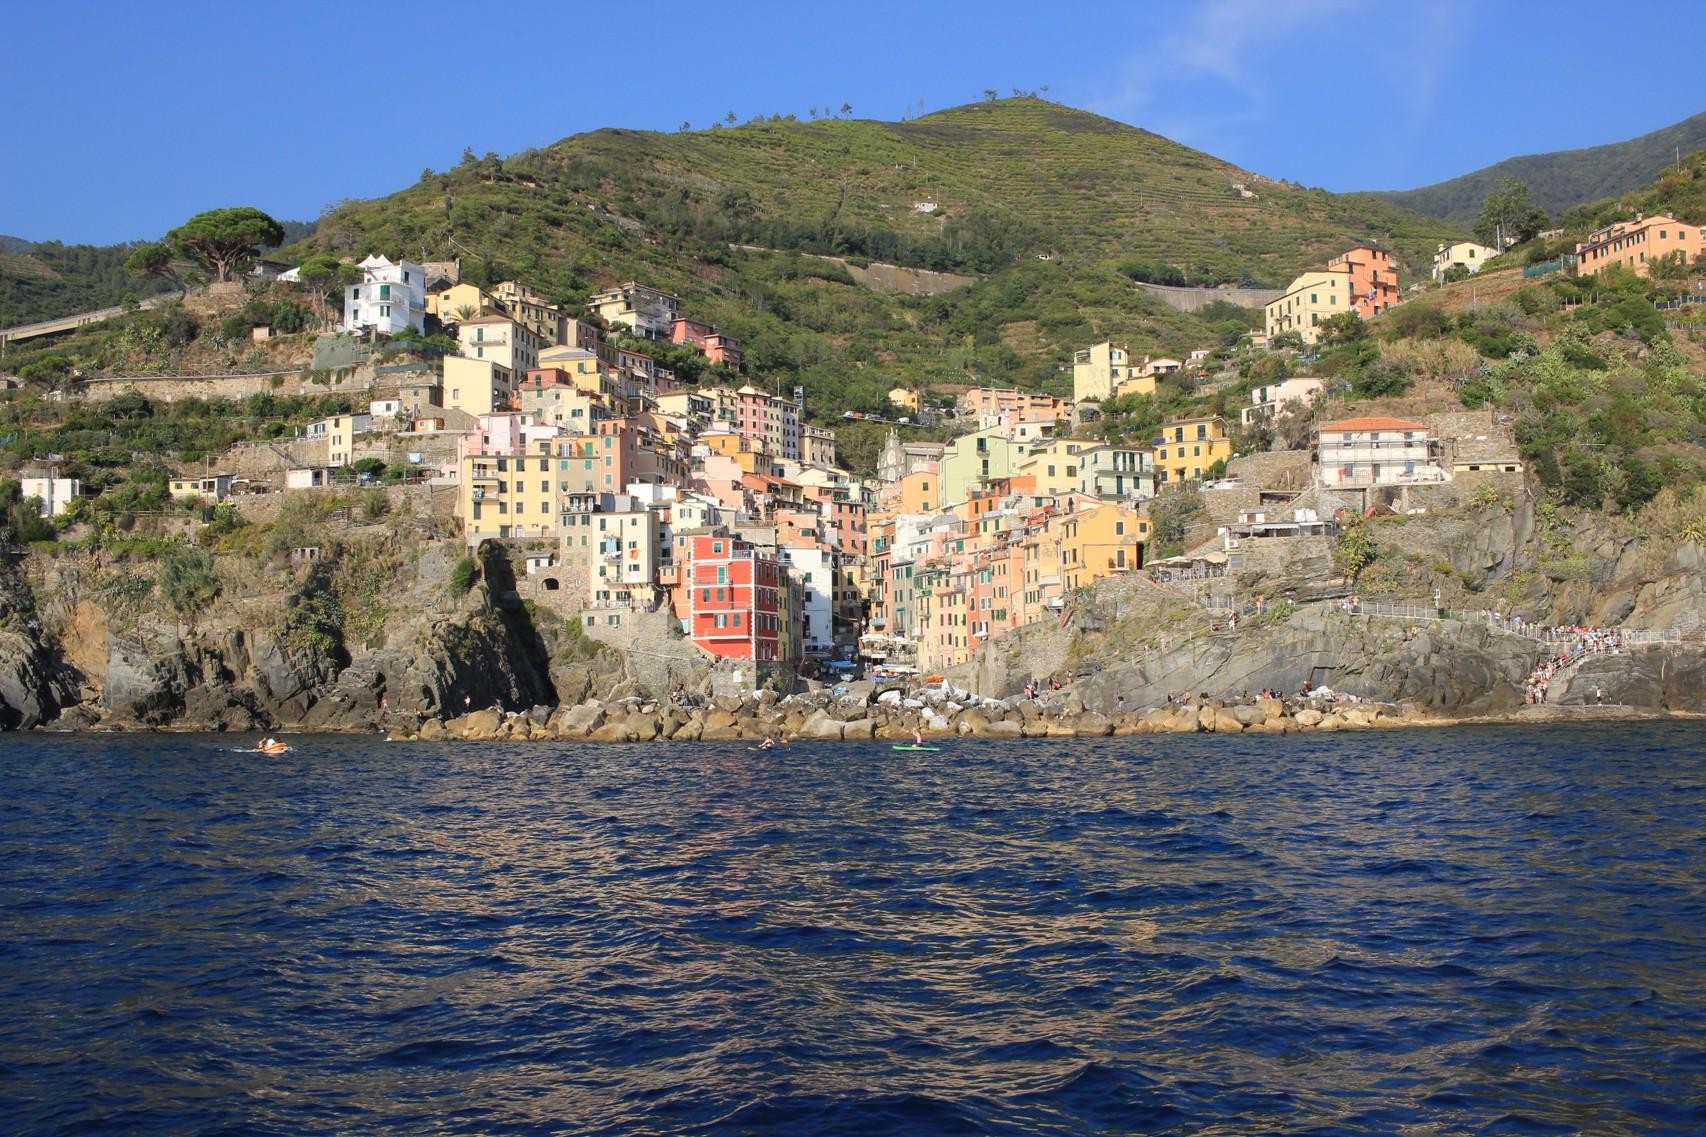 Boat trip to Vernazza, Cinque Terre